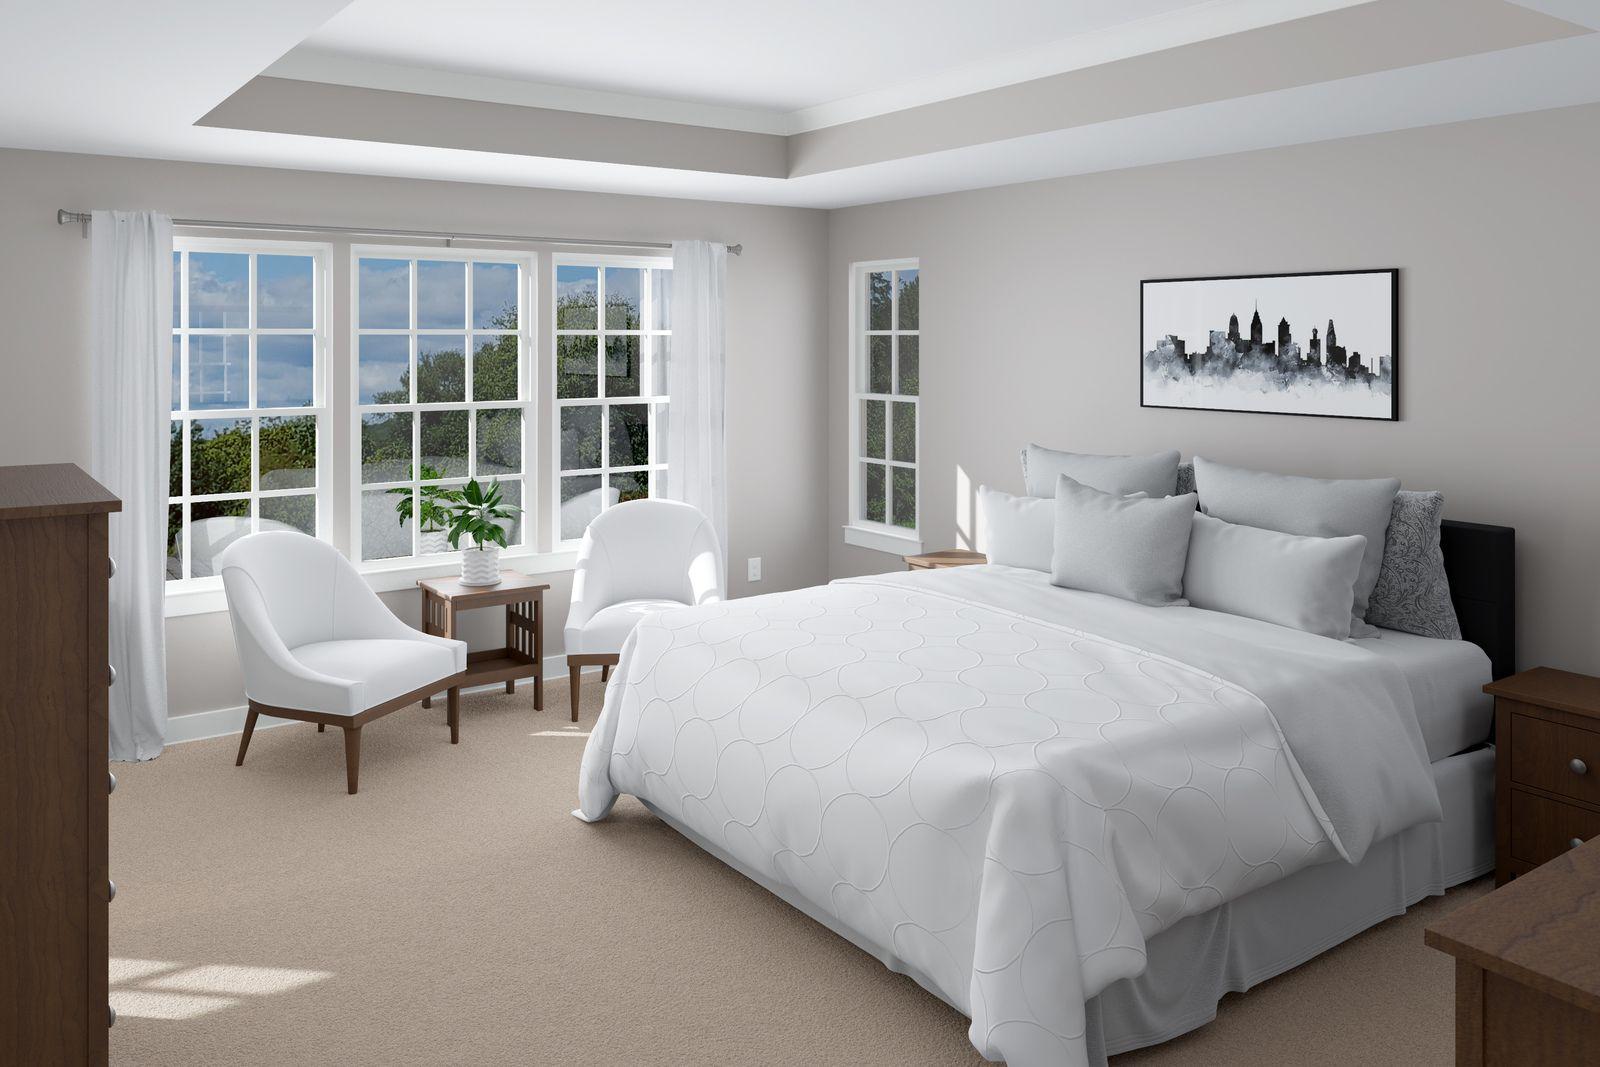 Bedroom featured in the Lakeland By Ryan Homes in Norfolk-Newport News, VA